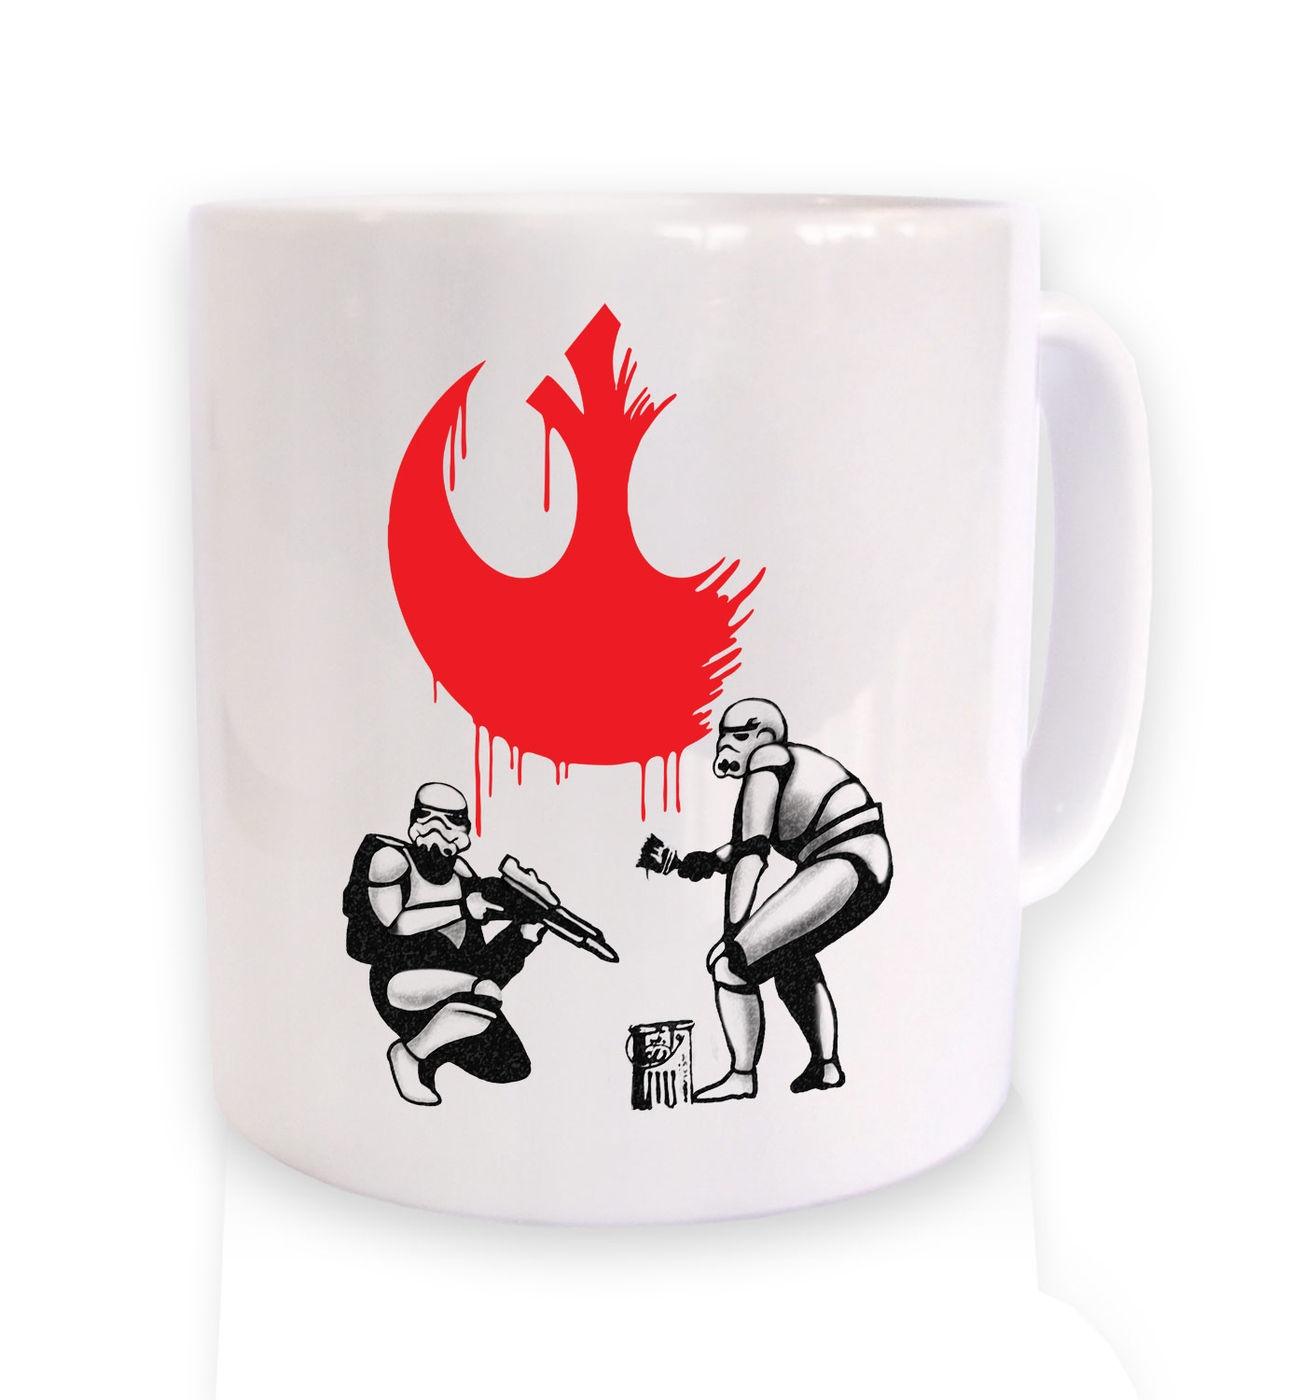 Rebel Stormtroopers mug - funny Star Wars Banksy mashup coffee mug